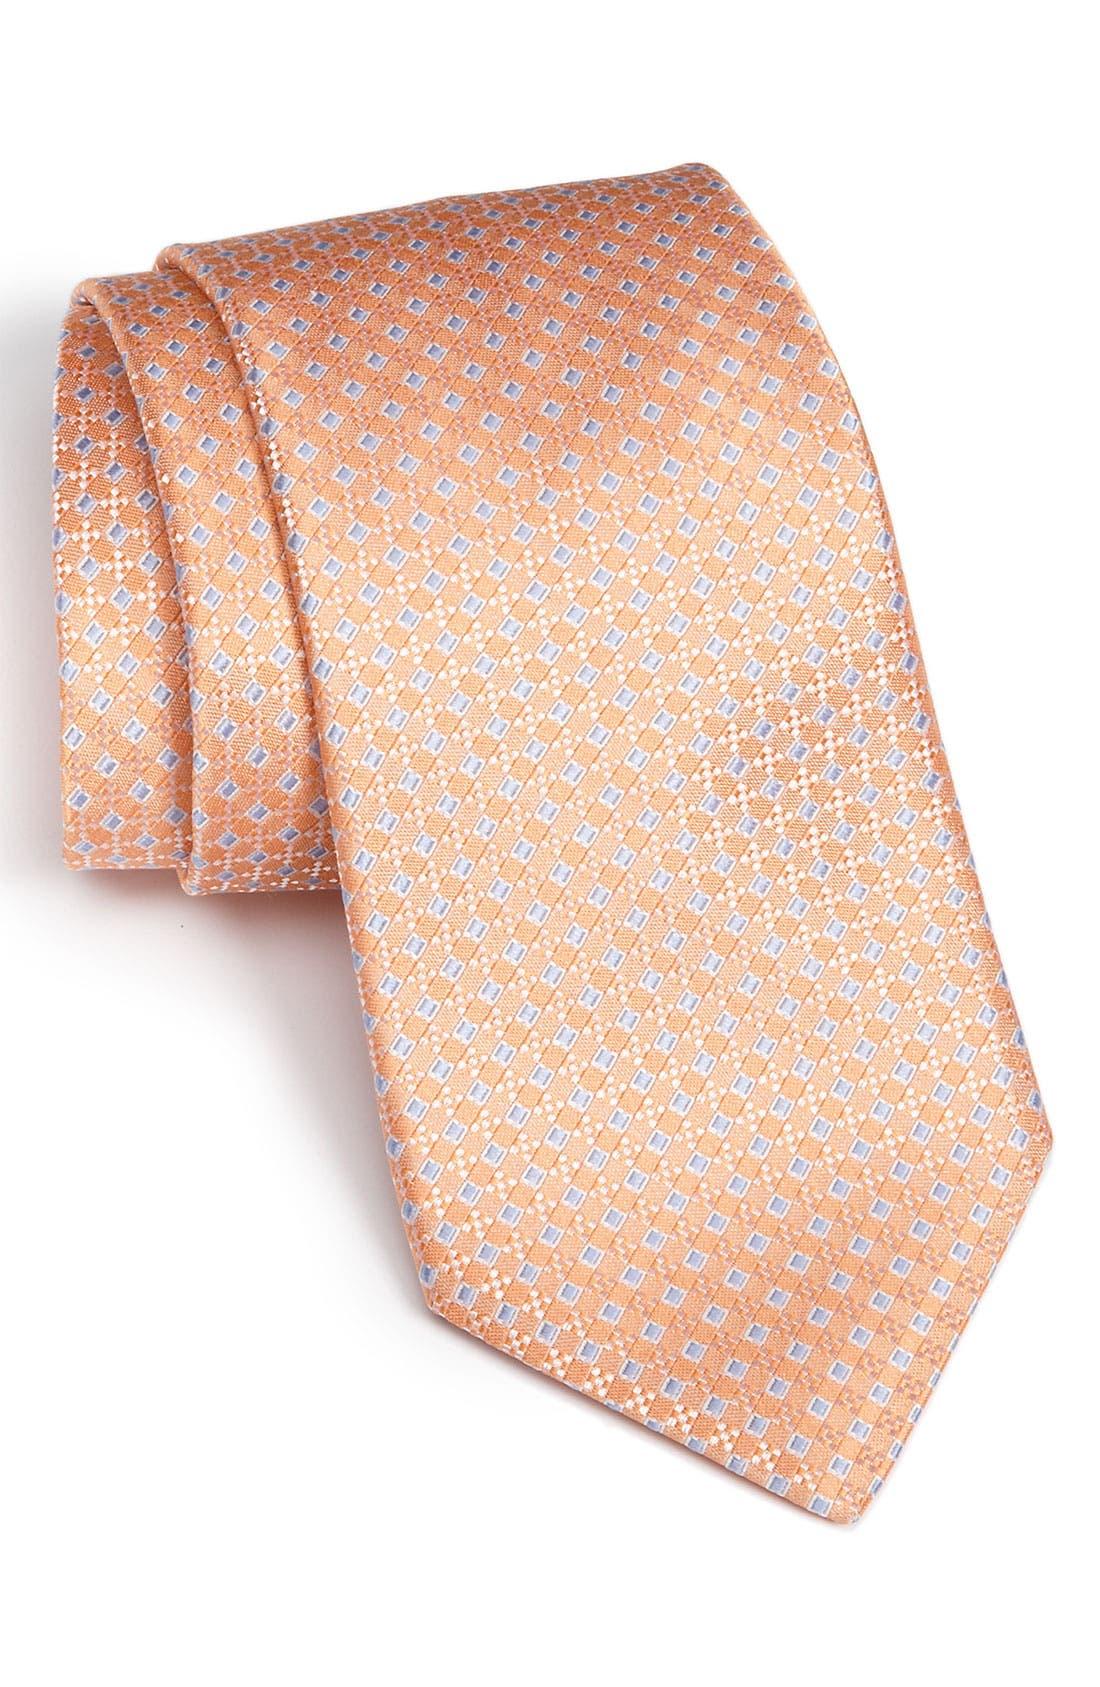 Alternate Image 1 Selected - Nordstrom Men's Shop Woven Silk Tie